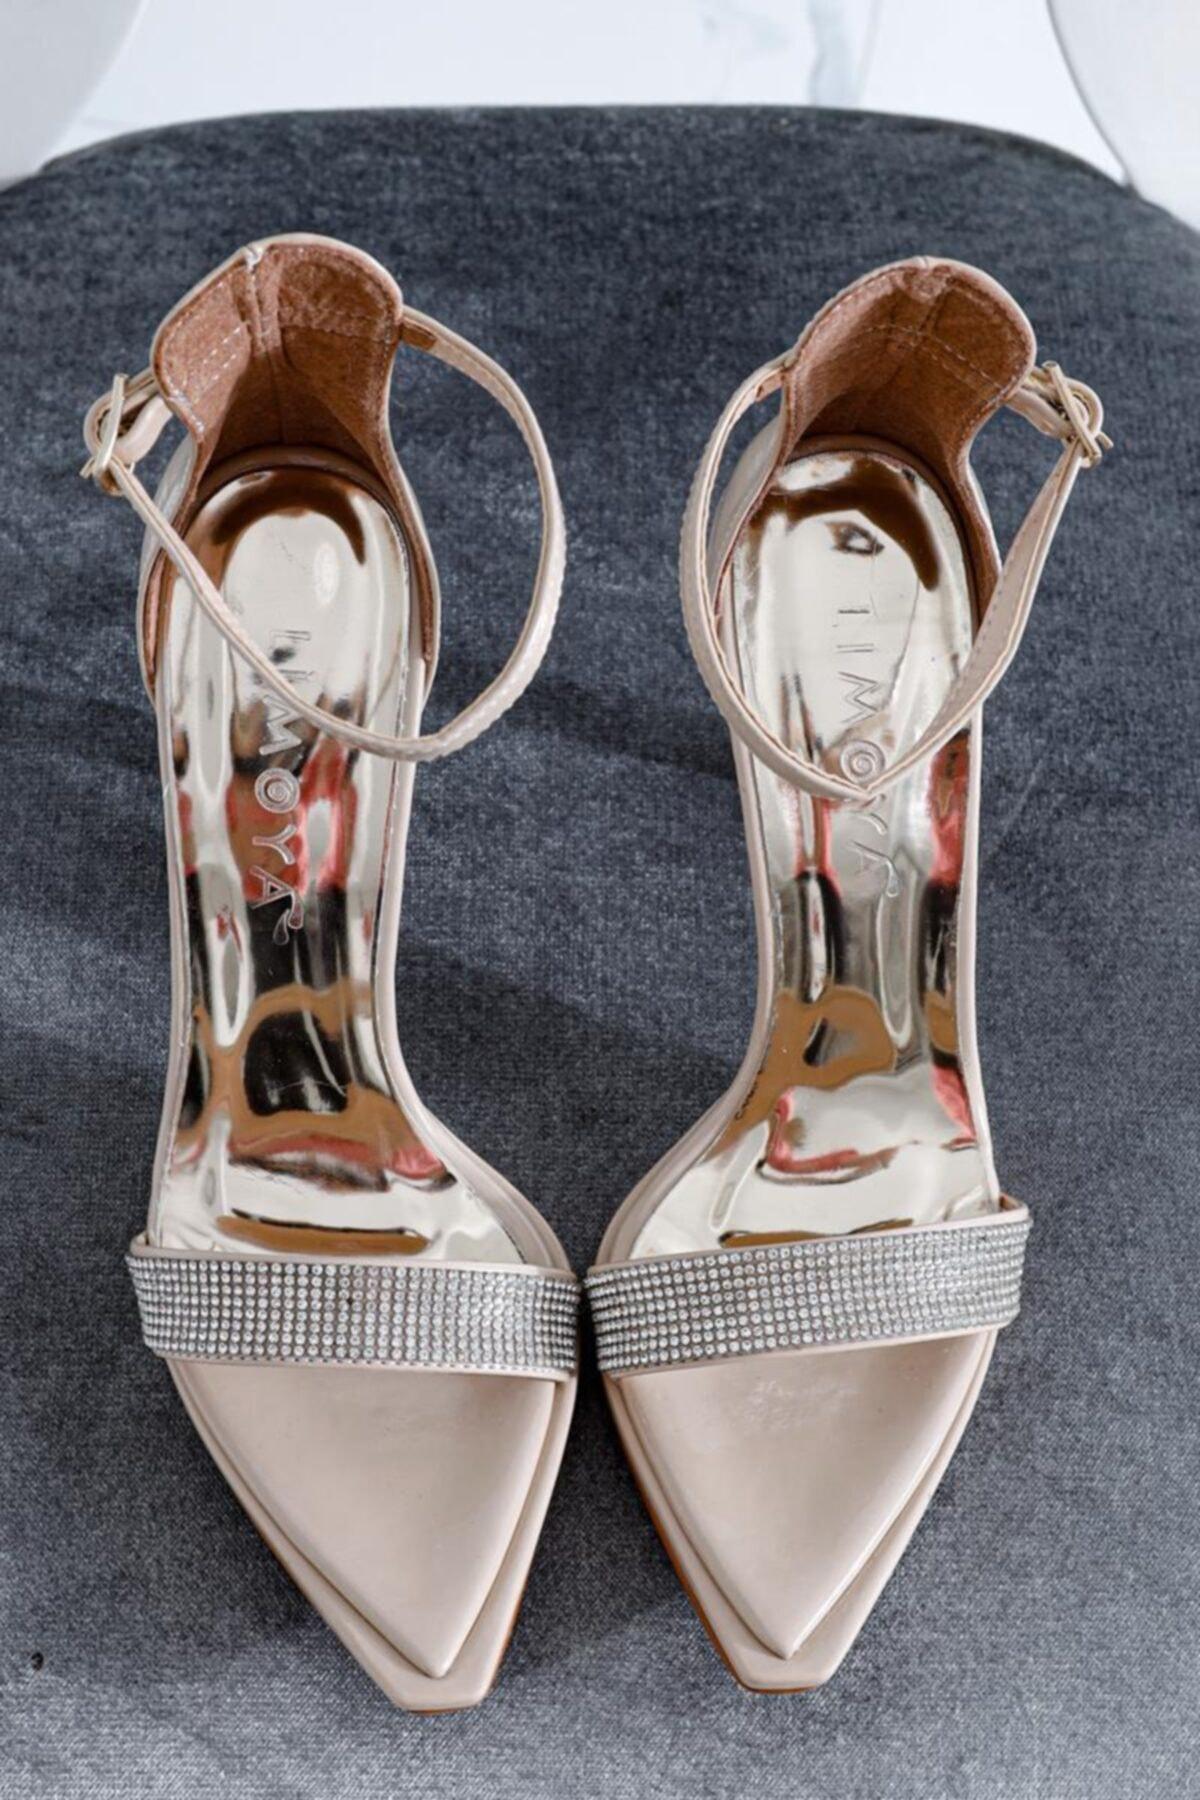 Limoya Amira Ten Rugan Taş Detaylı Tek Bant Ince Topuklu Sivri Sandalet 2